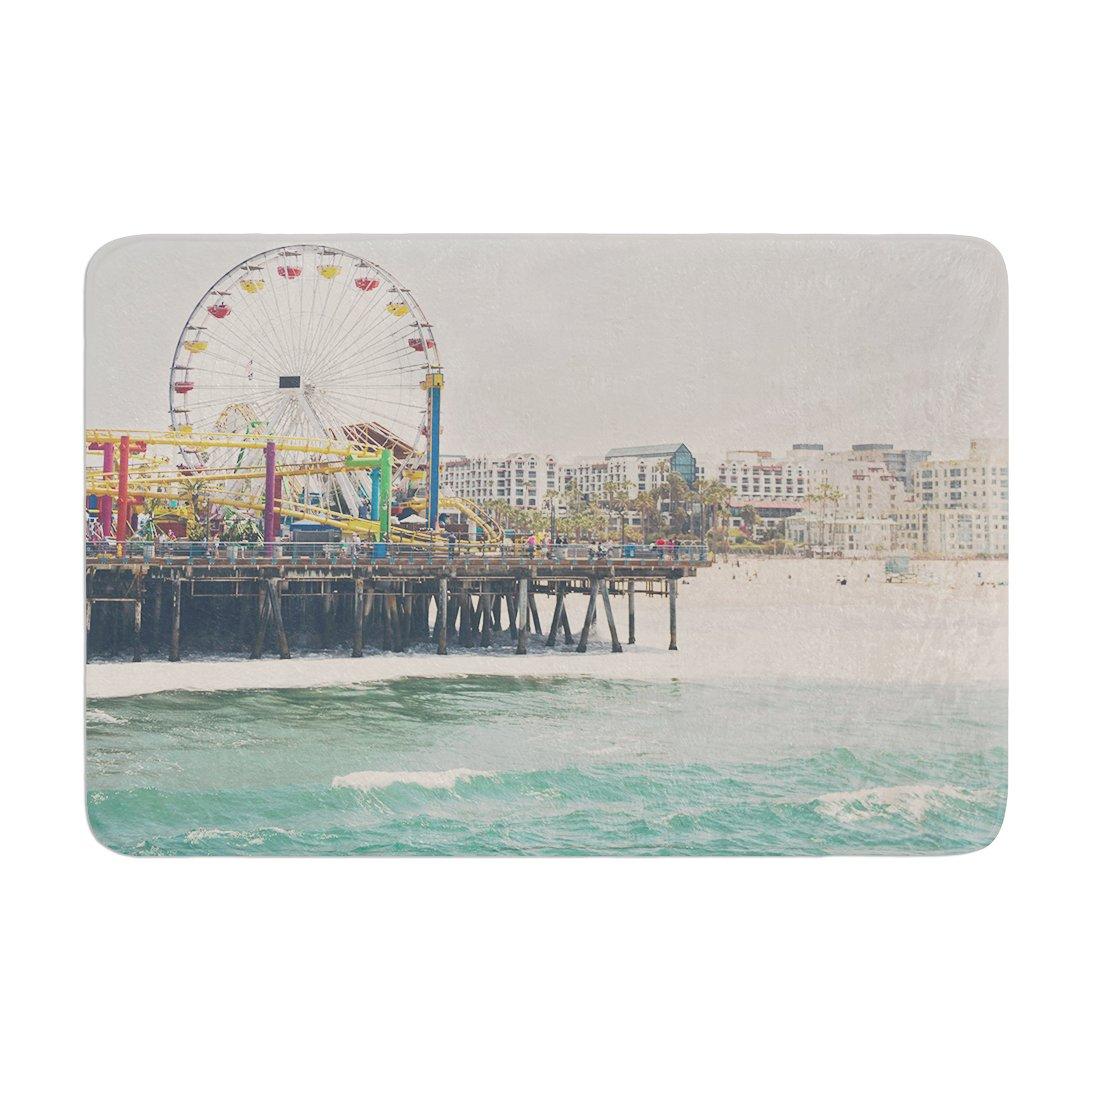 Kess InHouse Laura Evans The Pier at Santa Monica Coastal Teal Memory Foam Bath Mat 17 by 24